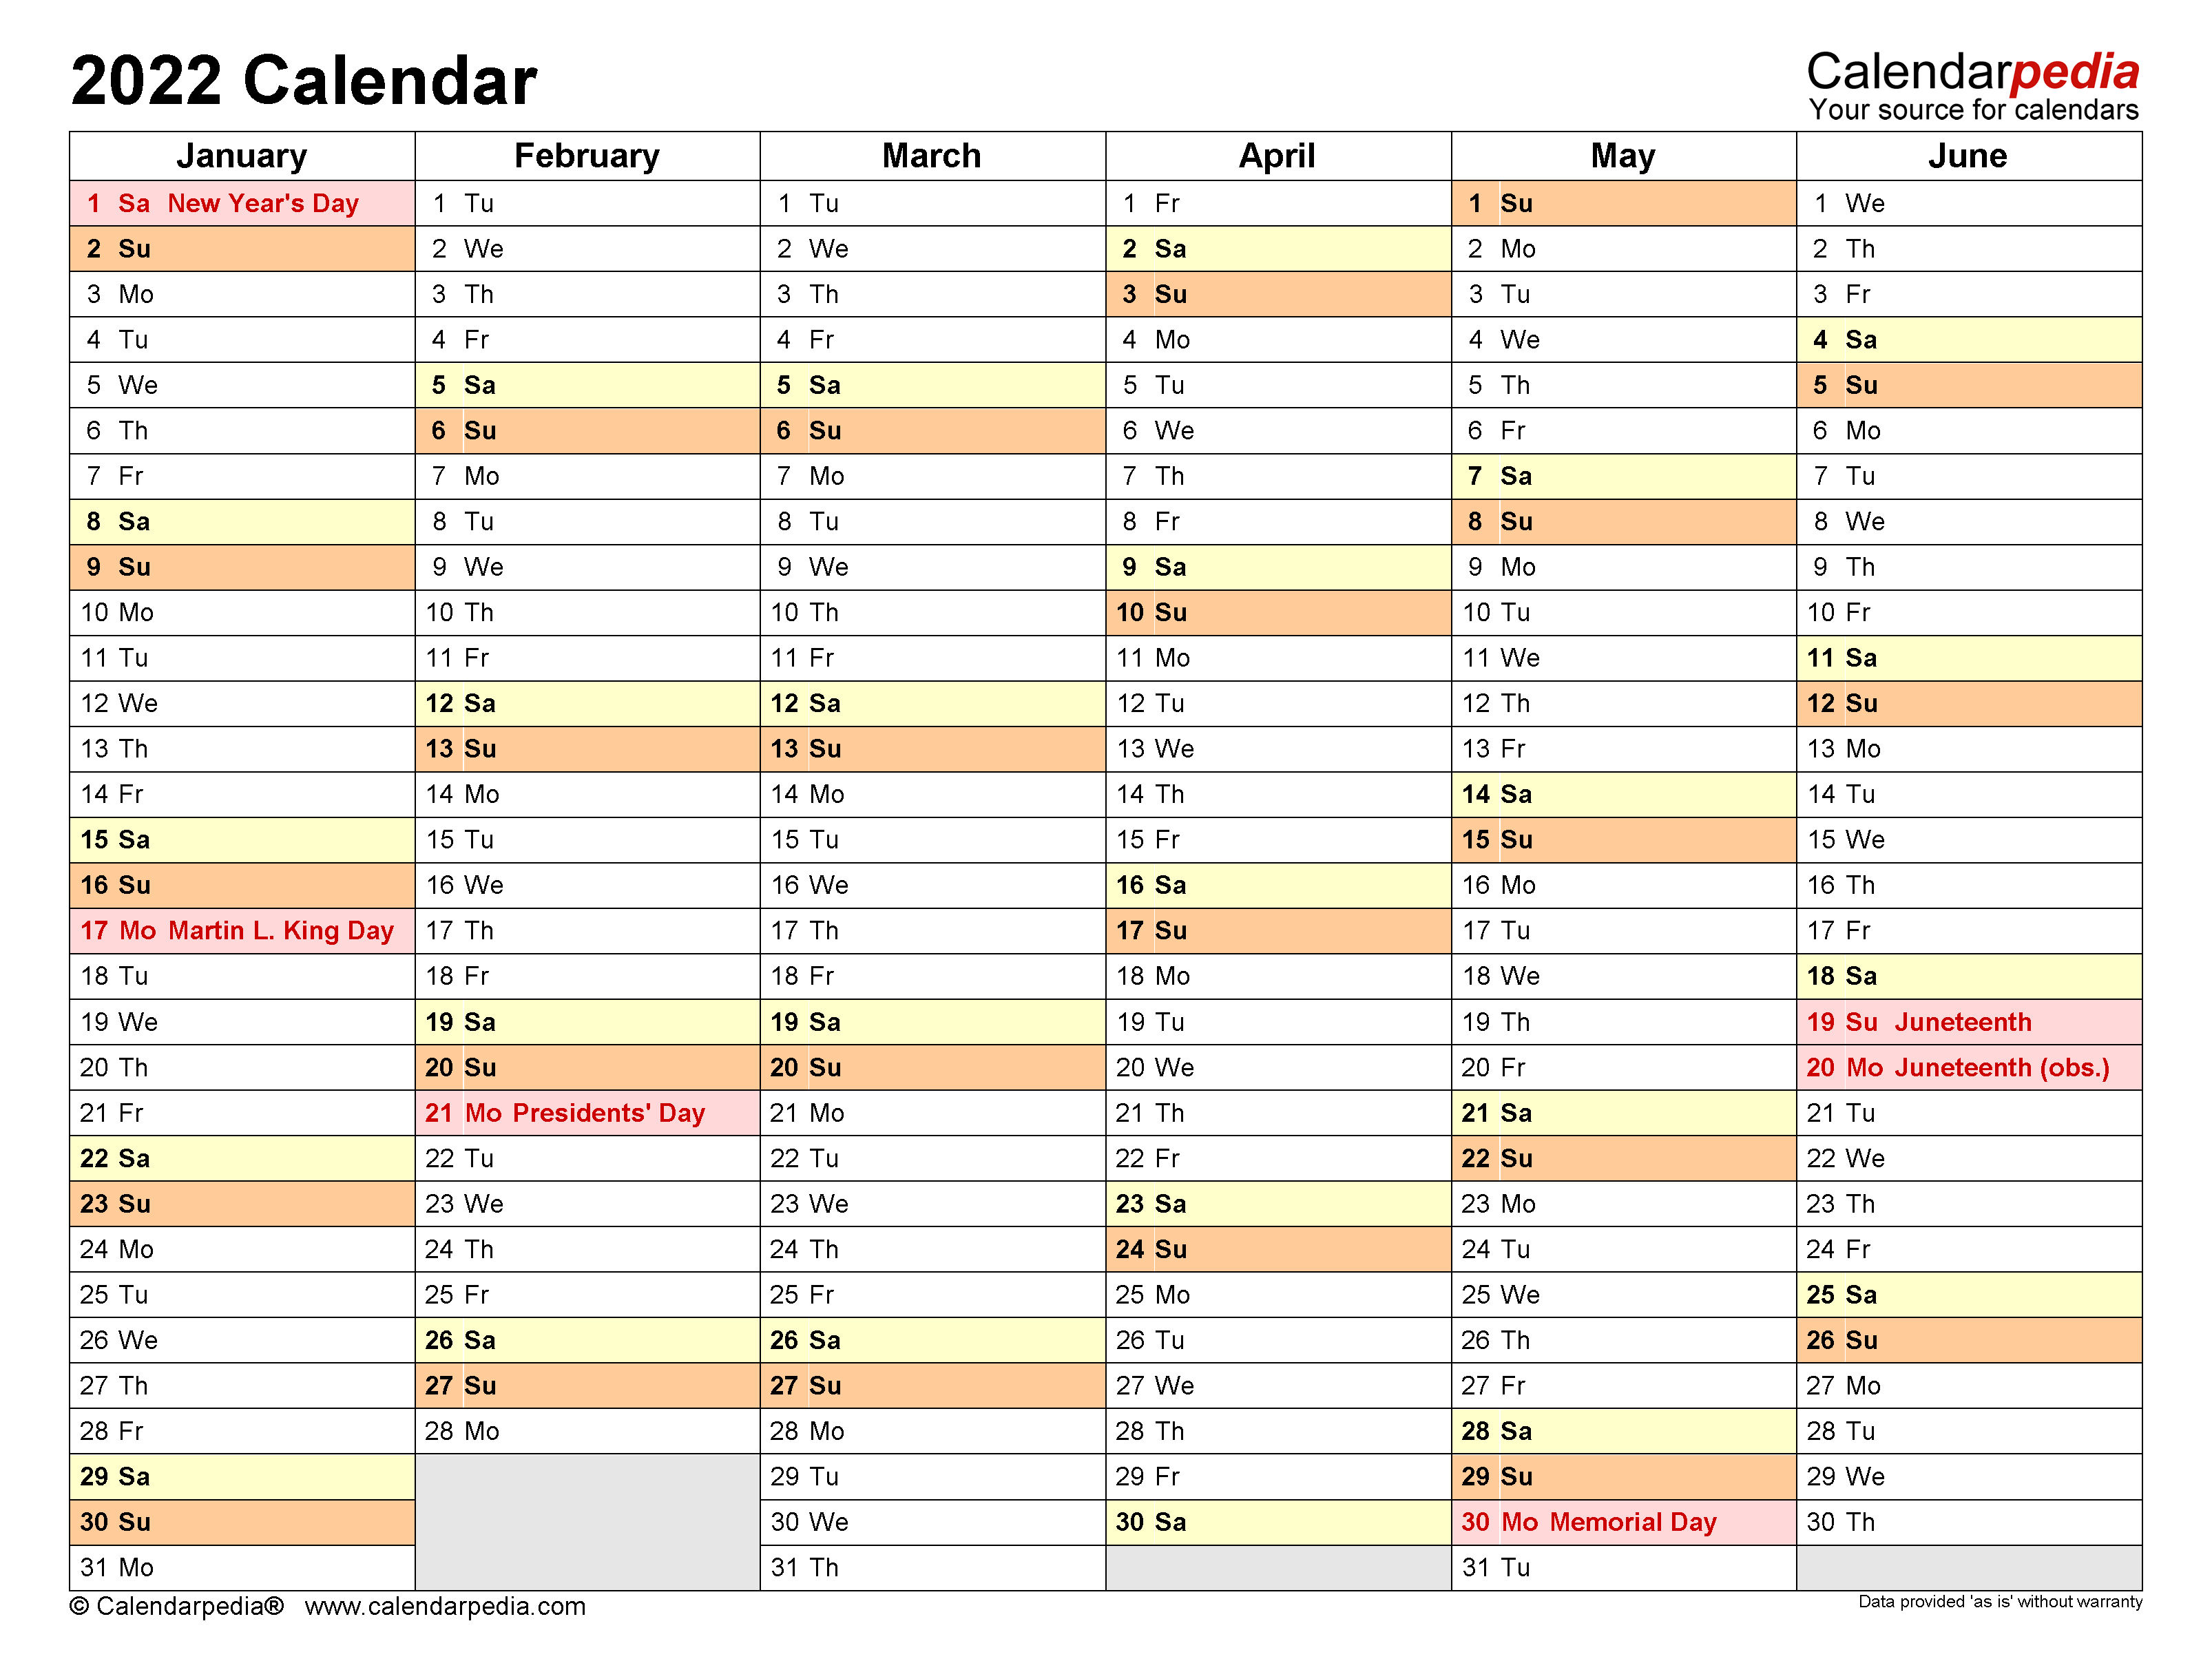 Windows Calendar 2022.2022 Calendar Free Printable Word Templates Calendarpedia